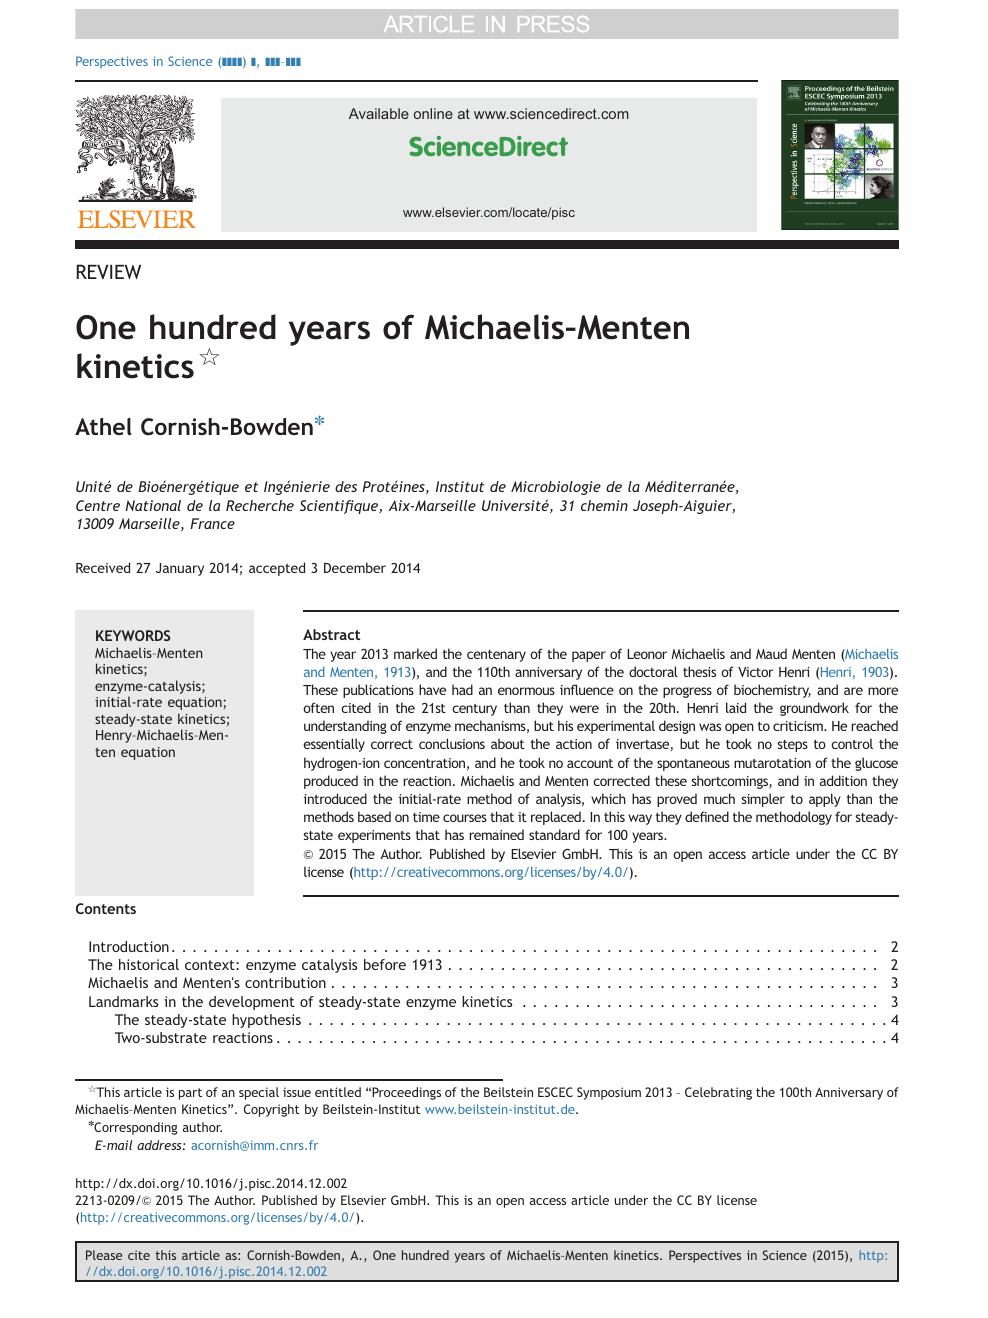 One Hundred Years Of Michaelismenten Kinetics Topic Of